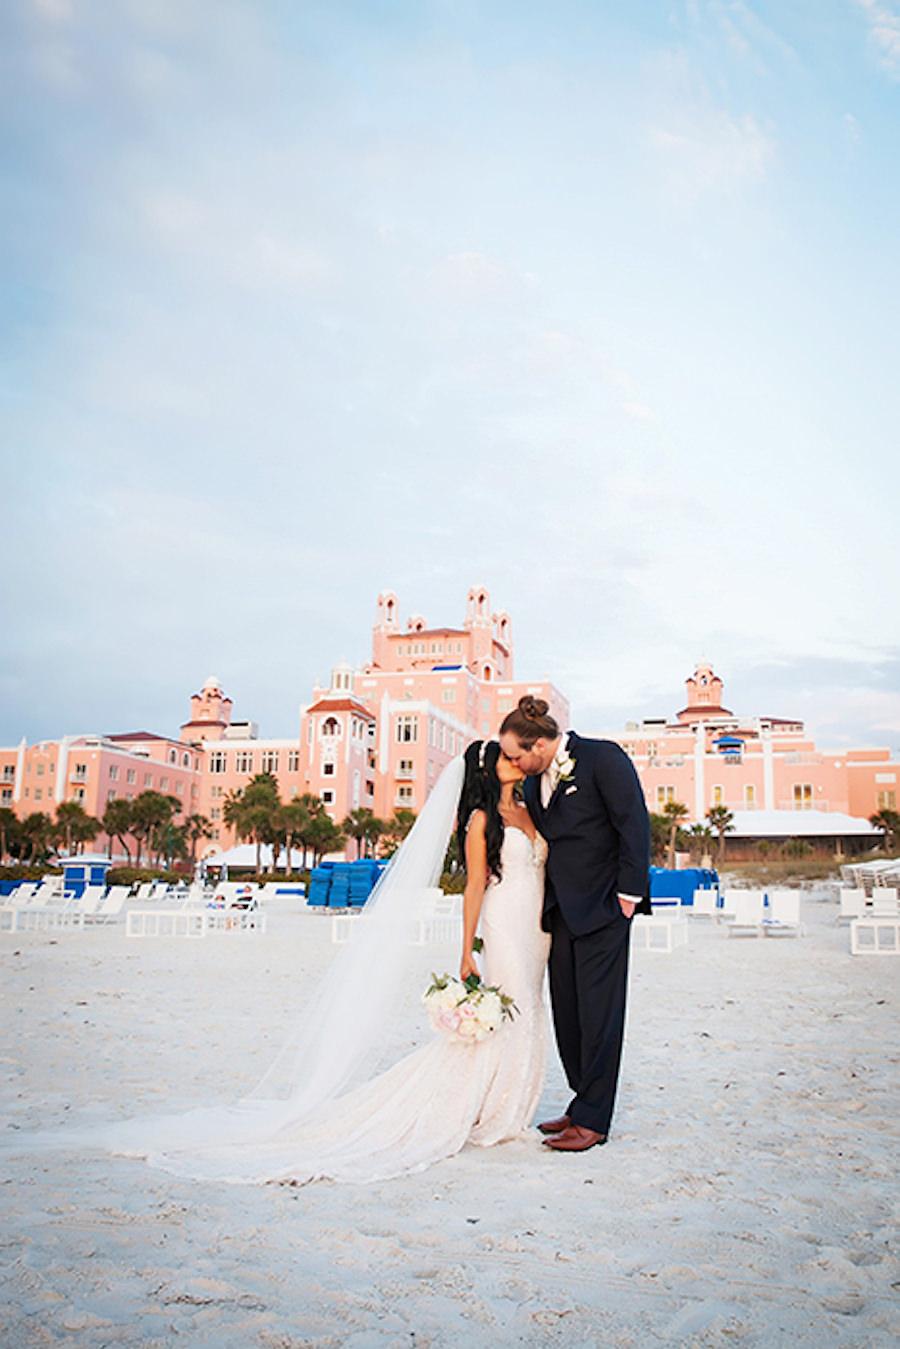 Bride and Groom Beach Wedding Portrait at St Pete Beach Wedding Venue The Don Cesar | St Petersburg Wedding Photographer Limelight Photography